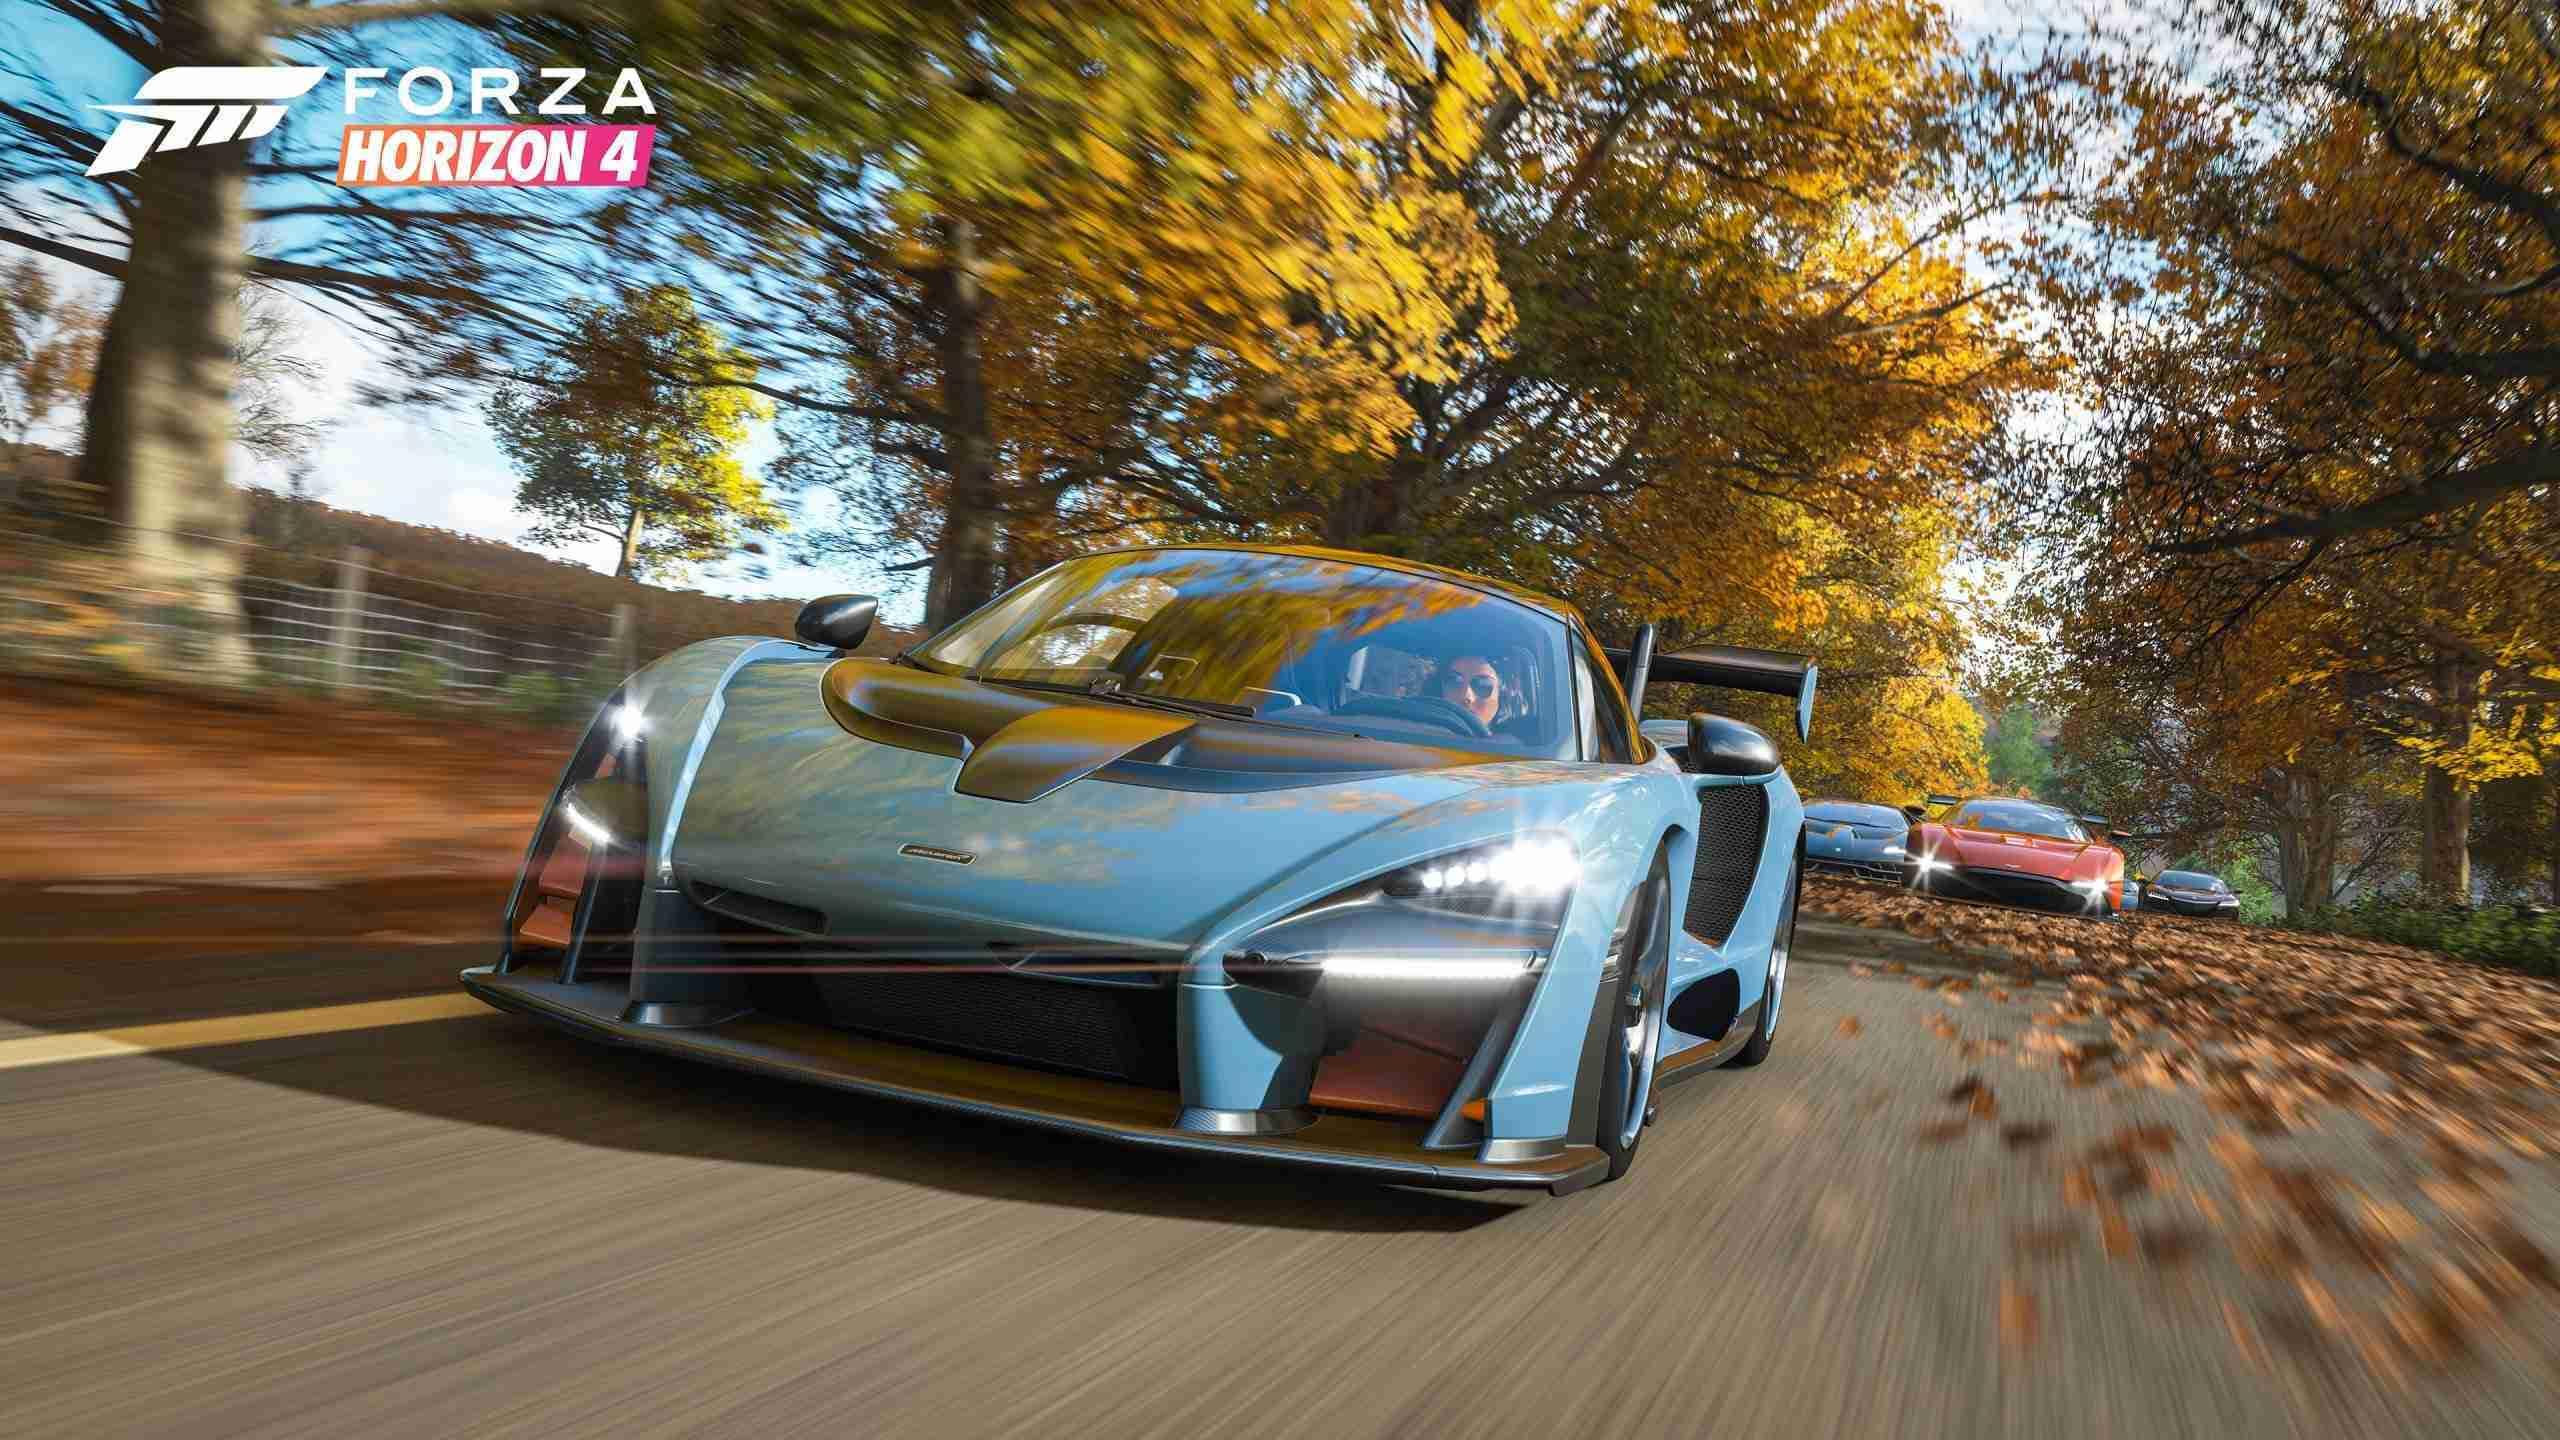 Forza Horizon 4 on Steam